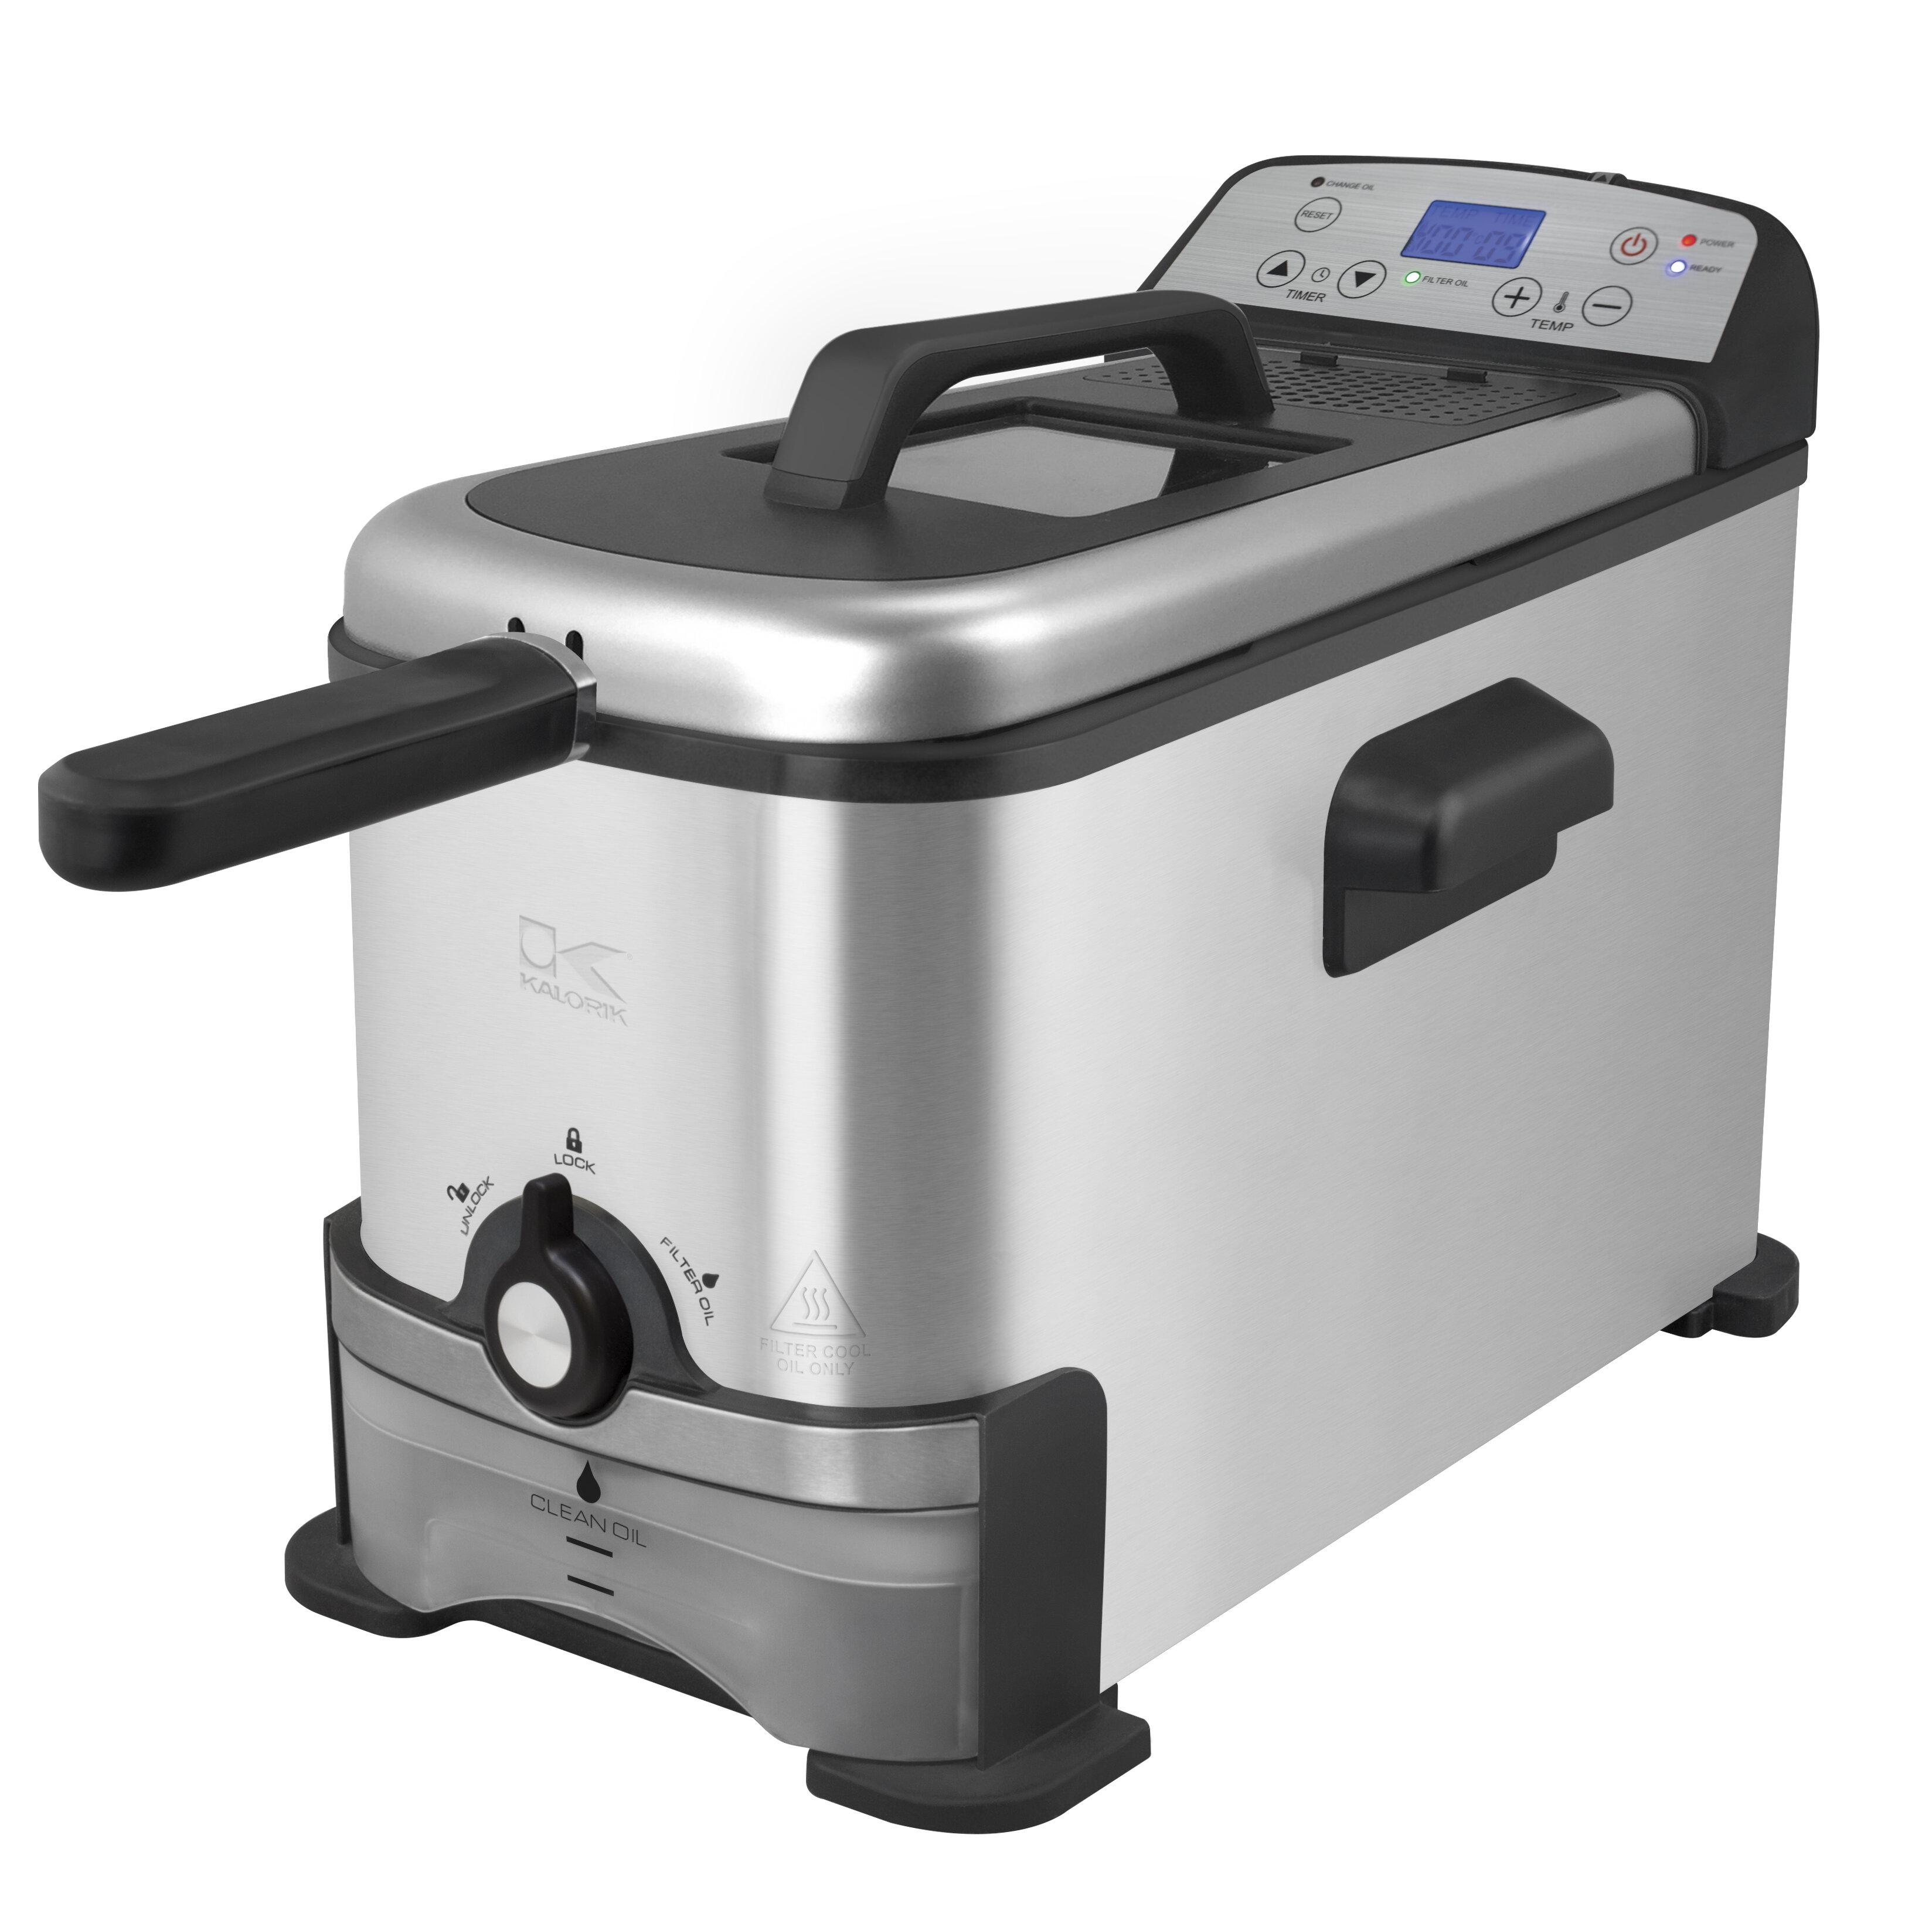 cf4b895605d Kalorik 4.5 Qt. Digital Deep Fryer with Oil Filtration